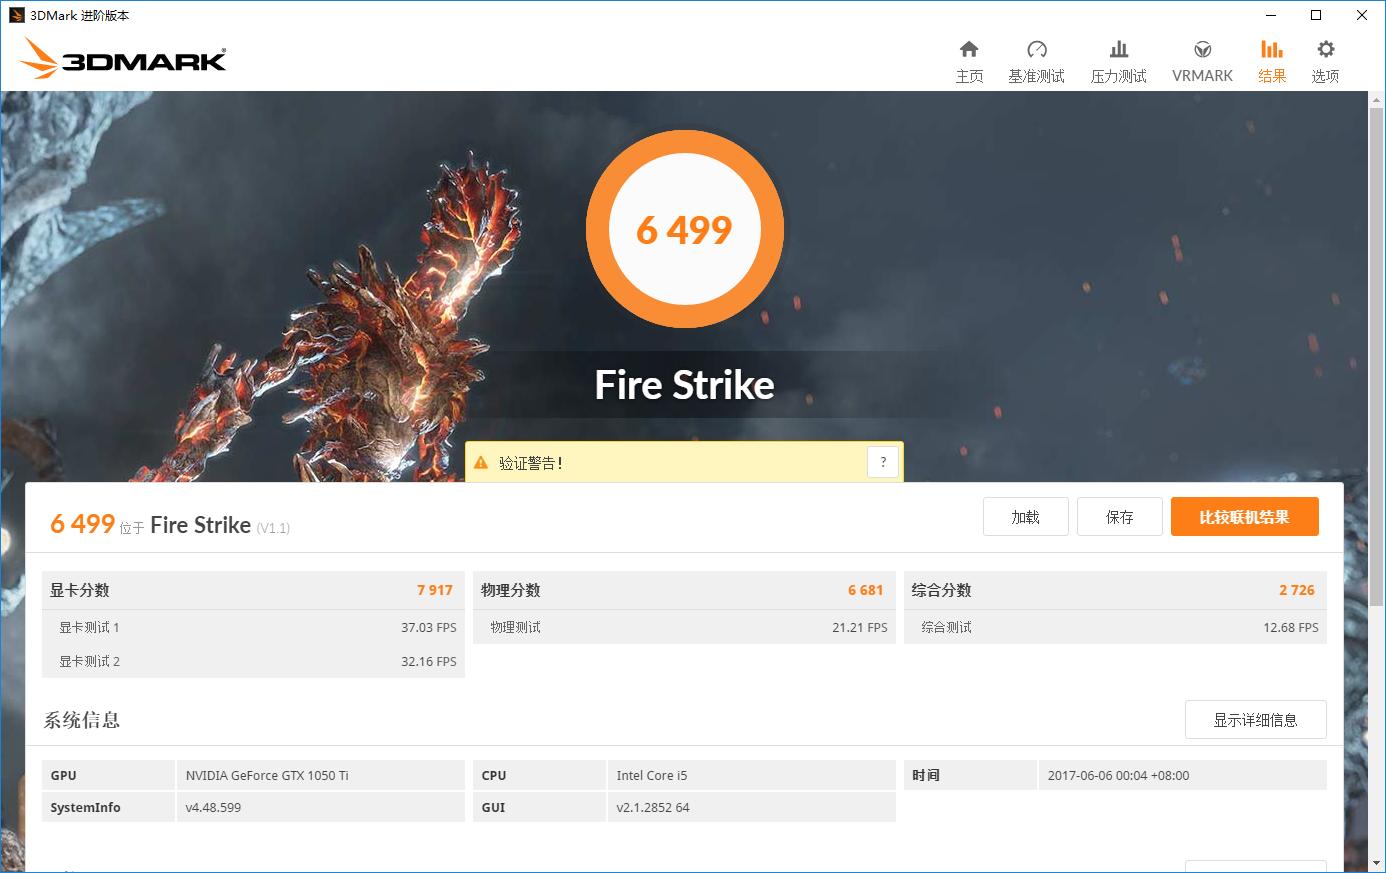 Fig-22_3Dmark_fire strike.PNG